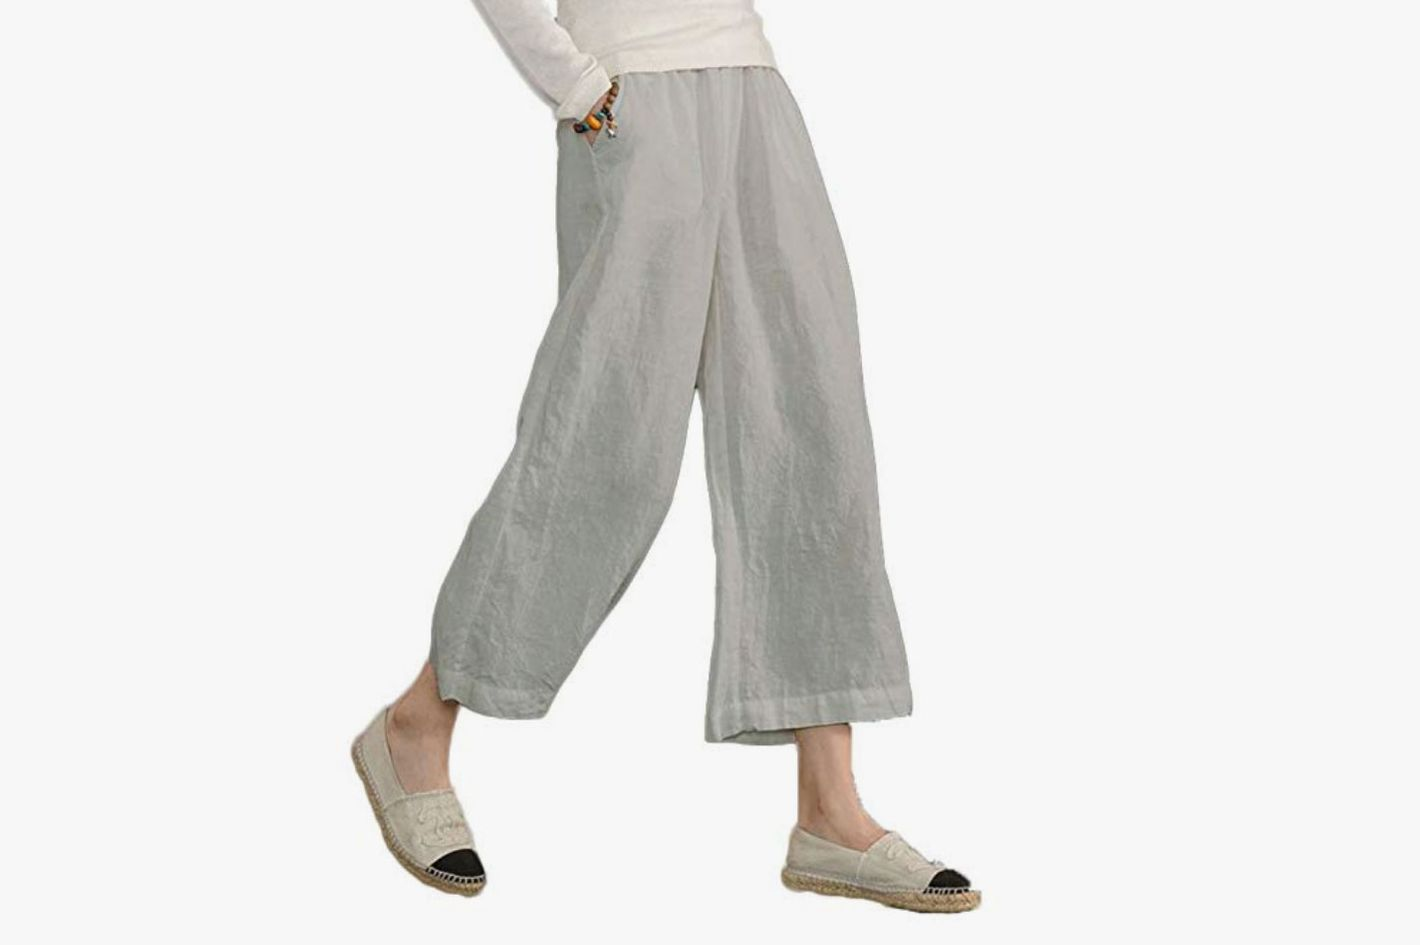 Ecupper Women's Elastic Waist Causal Loose Trousers Linen Cropped Wide Leg Pants